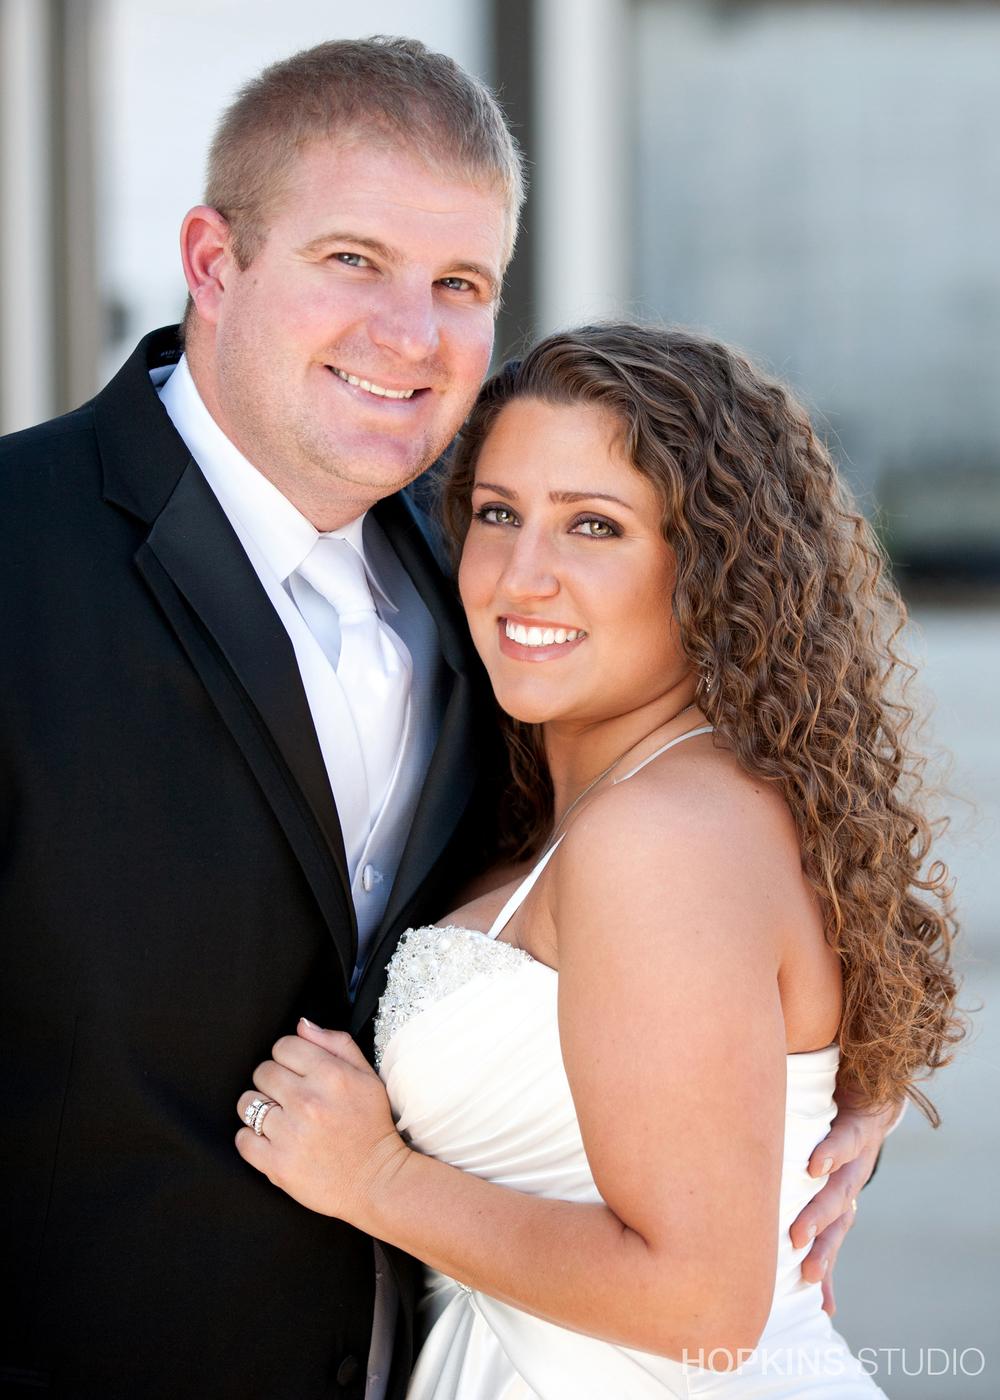 Wedding-Photography-Vineland-Center-Southwest-Michigan_27.jpg